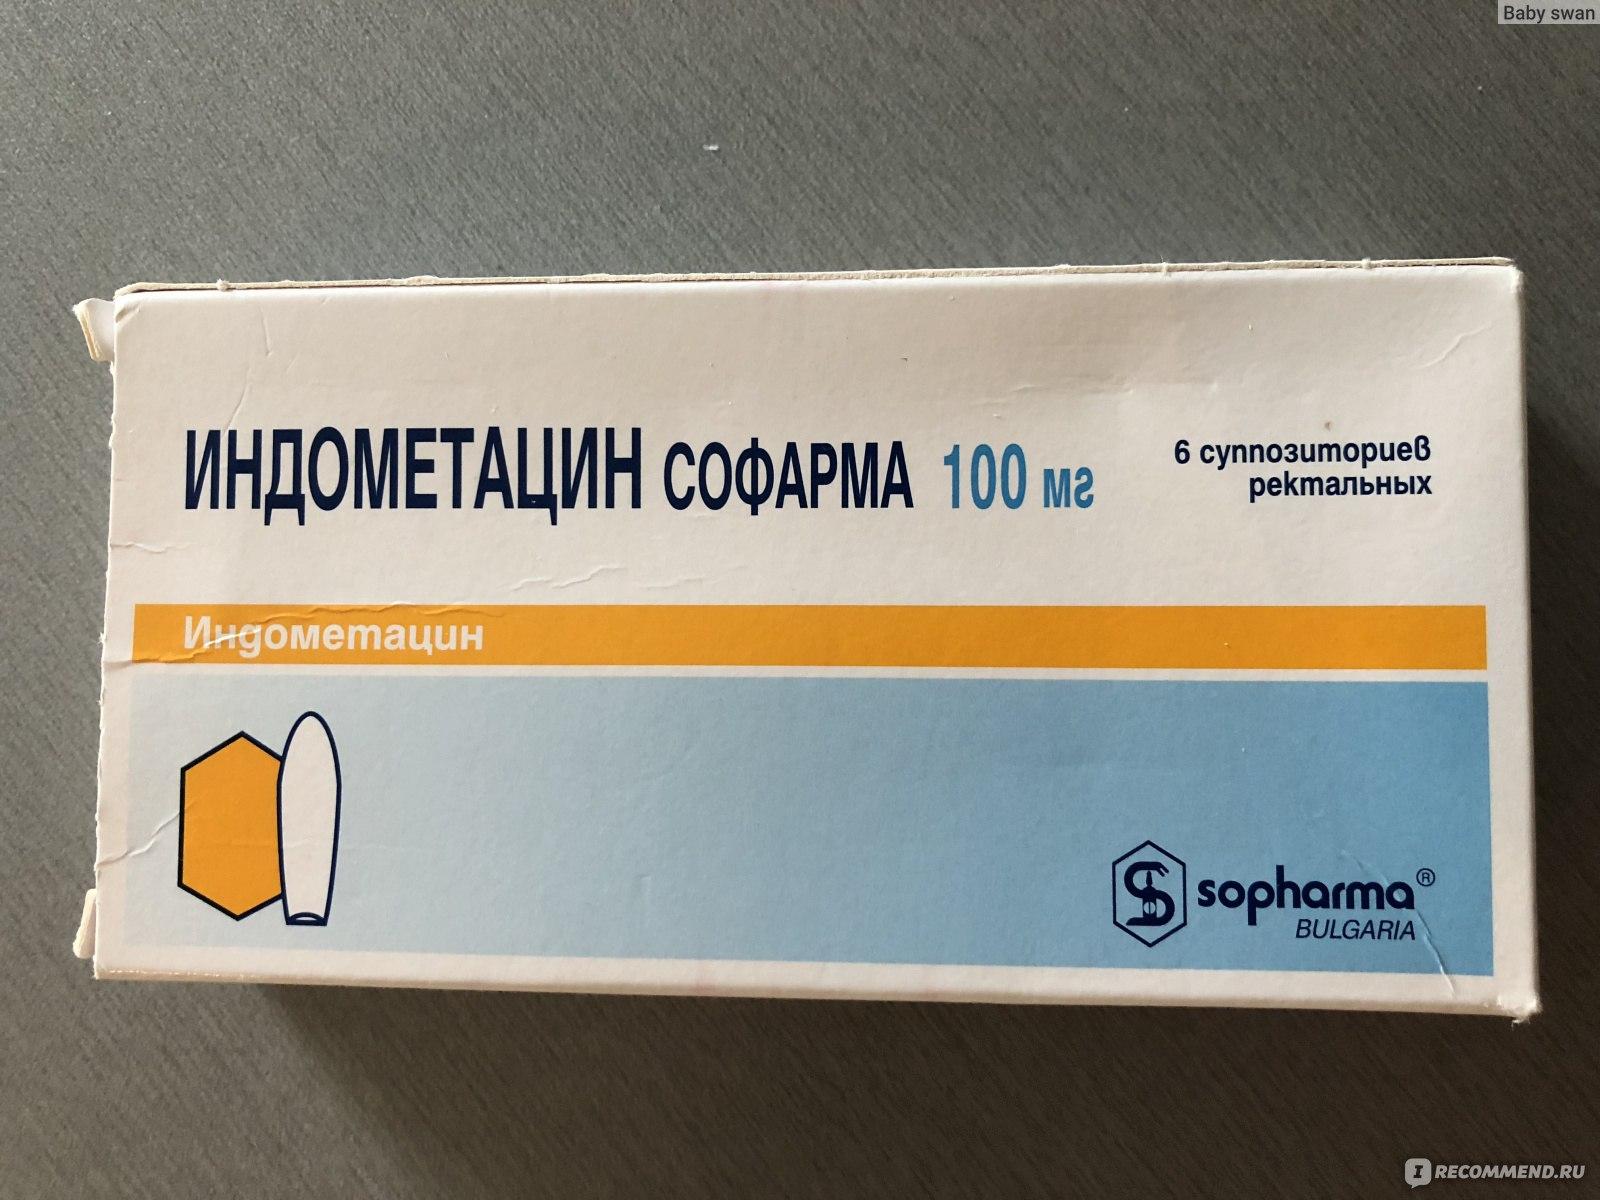 свечи индометацин софарма от простатита